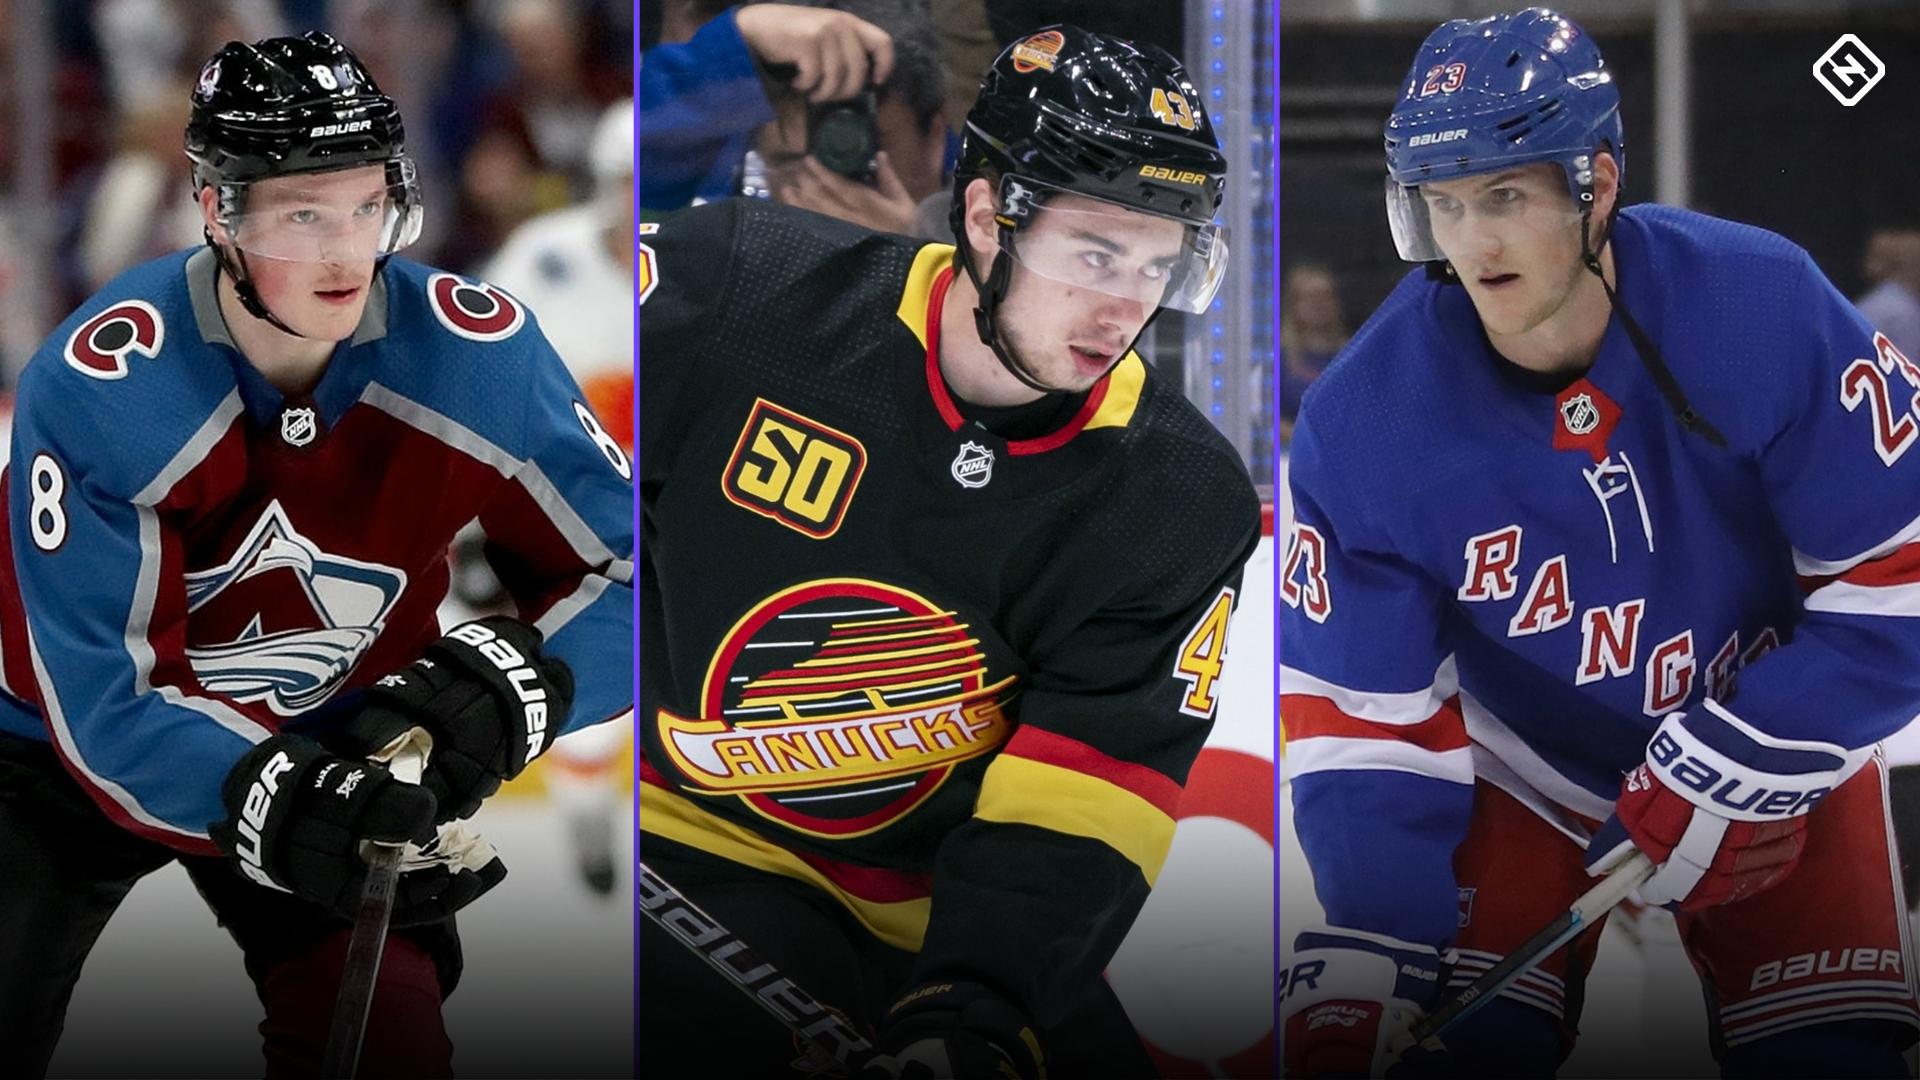 Defensmen Cale Makar, Quinn Hughes and Adam Fox discuss how college hockey prepared them for NHL 1